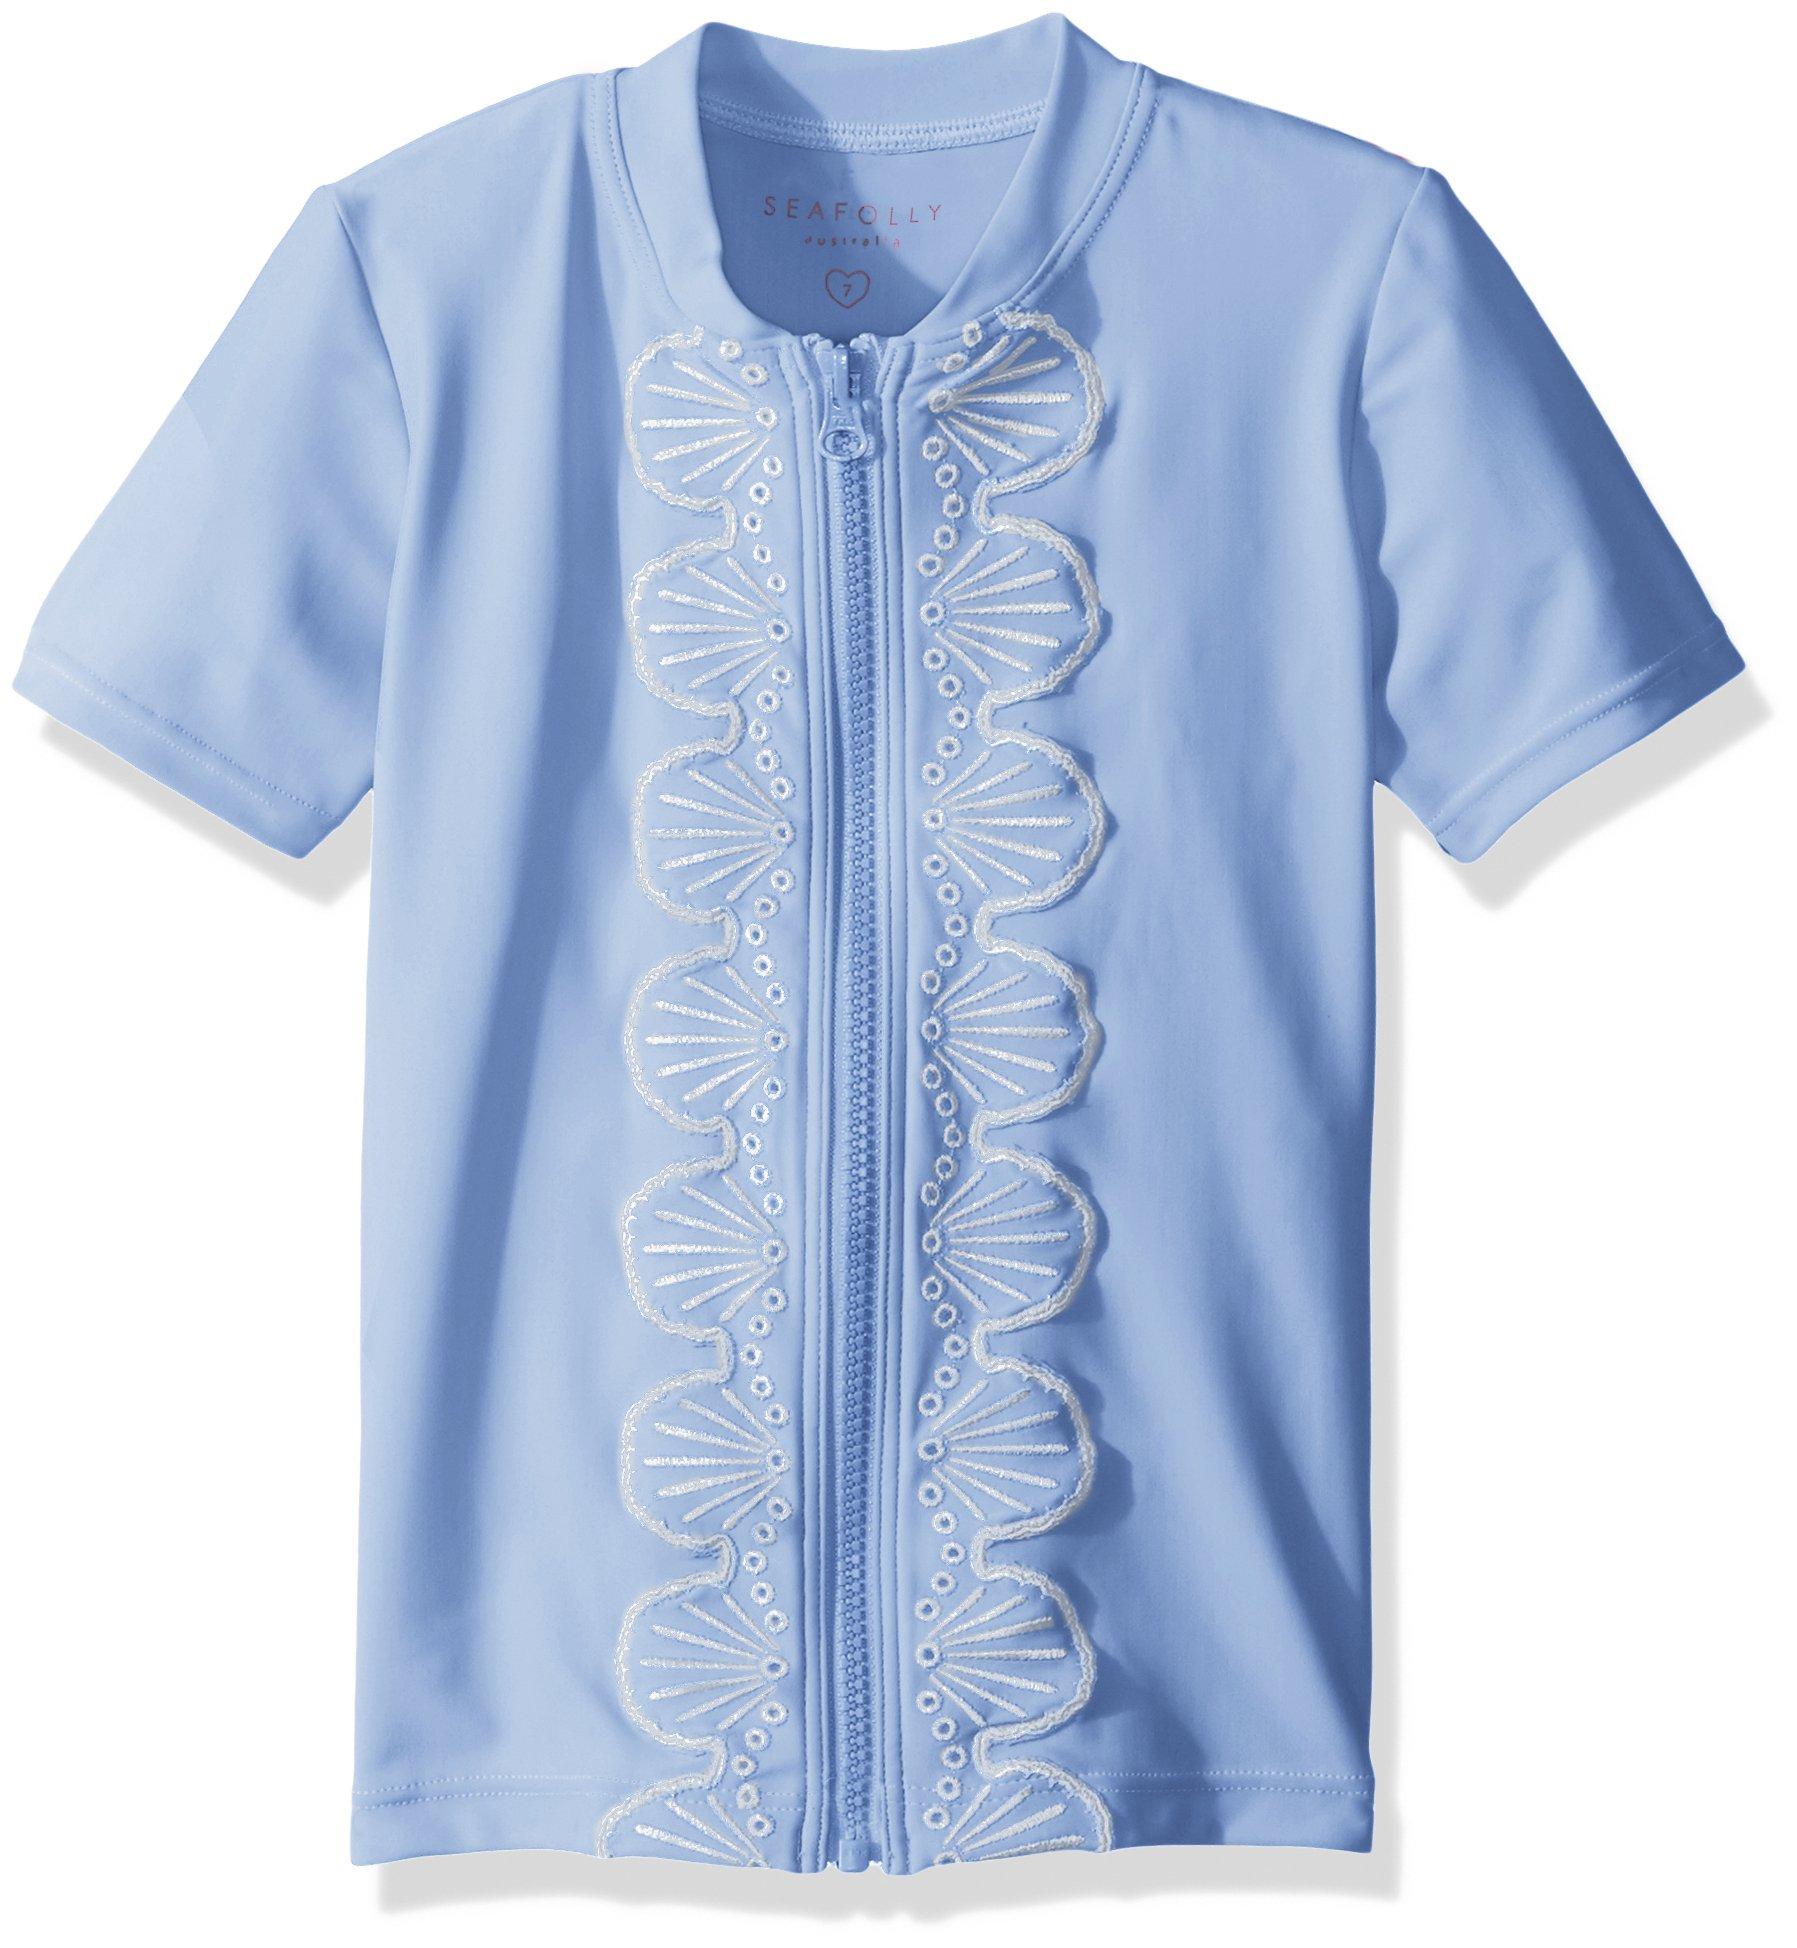 Seafolly Little Girls' Sweet Summer S/s Zip Front Swimsuit Rashguard, Bluebell, 4